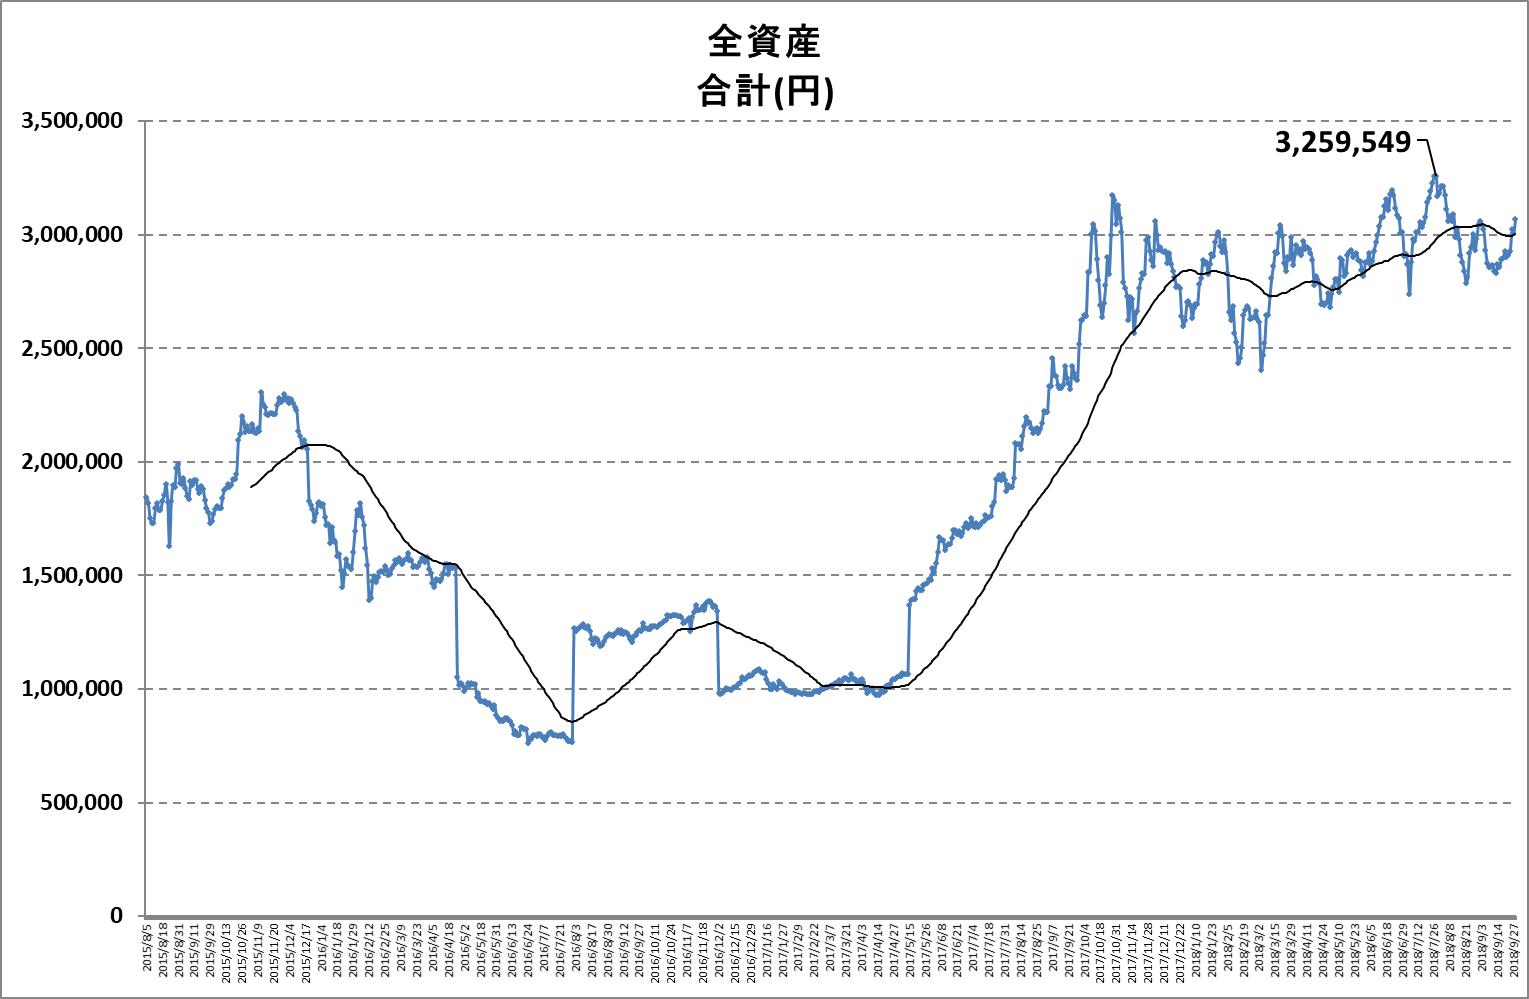 636dea95af 株式投資日記 · グラフ(2018年09月28日): (2018-09-29 16:10:17)